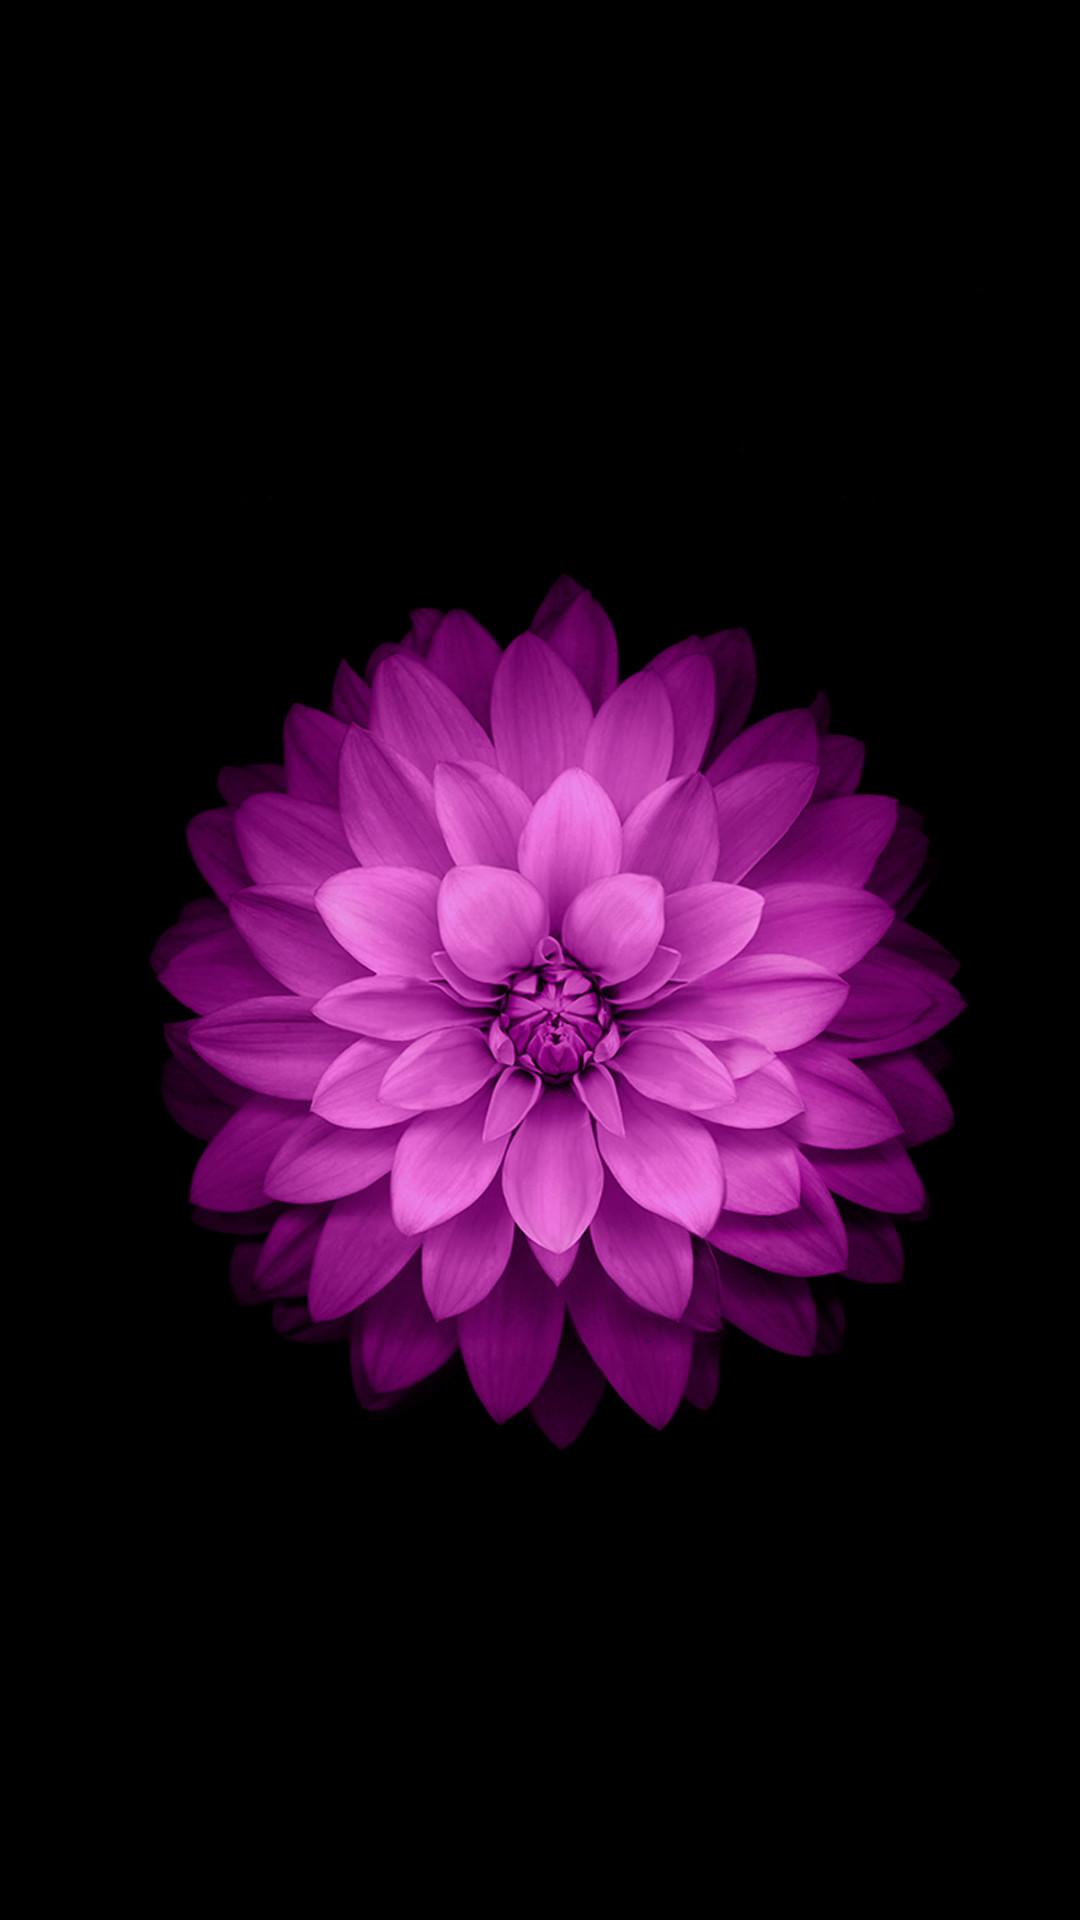 iPhone 6 Plus Wallpaper Official – Purple Lotus Flower